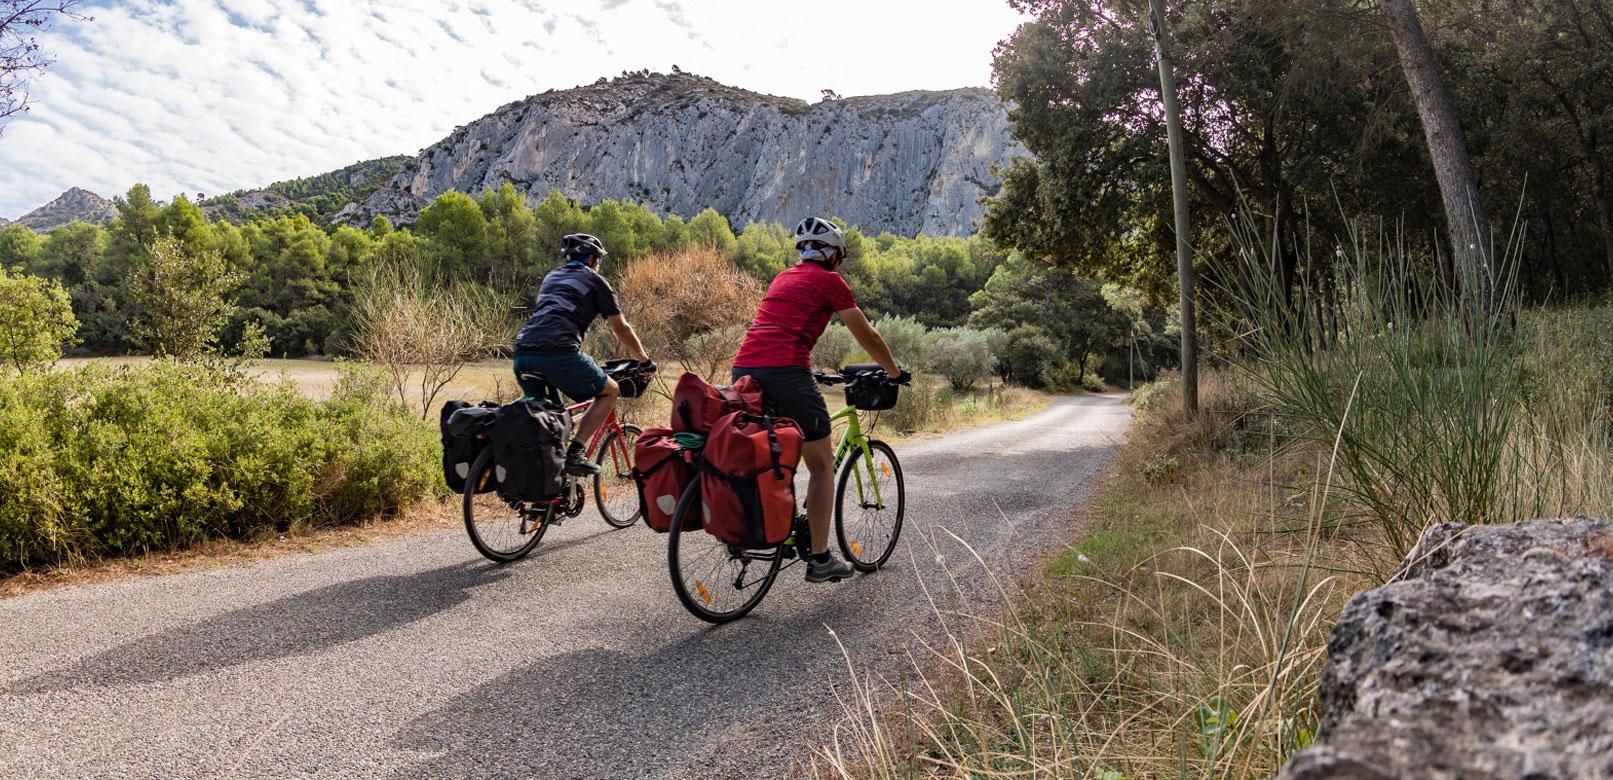 Vélo en Vaucluse © Rathay